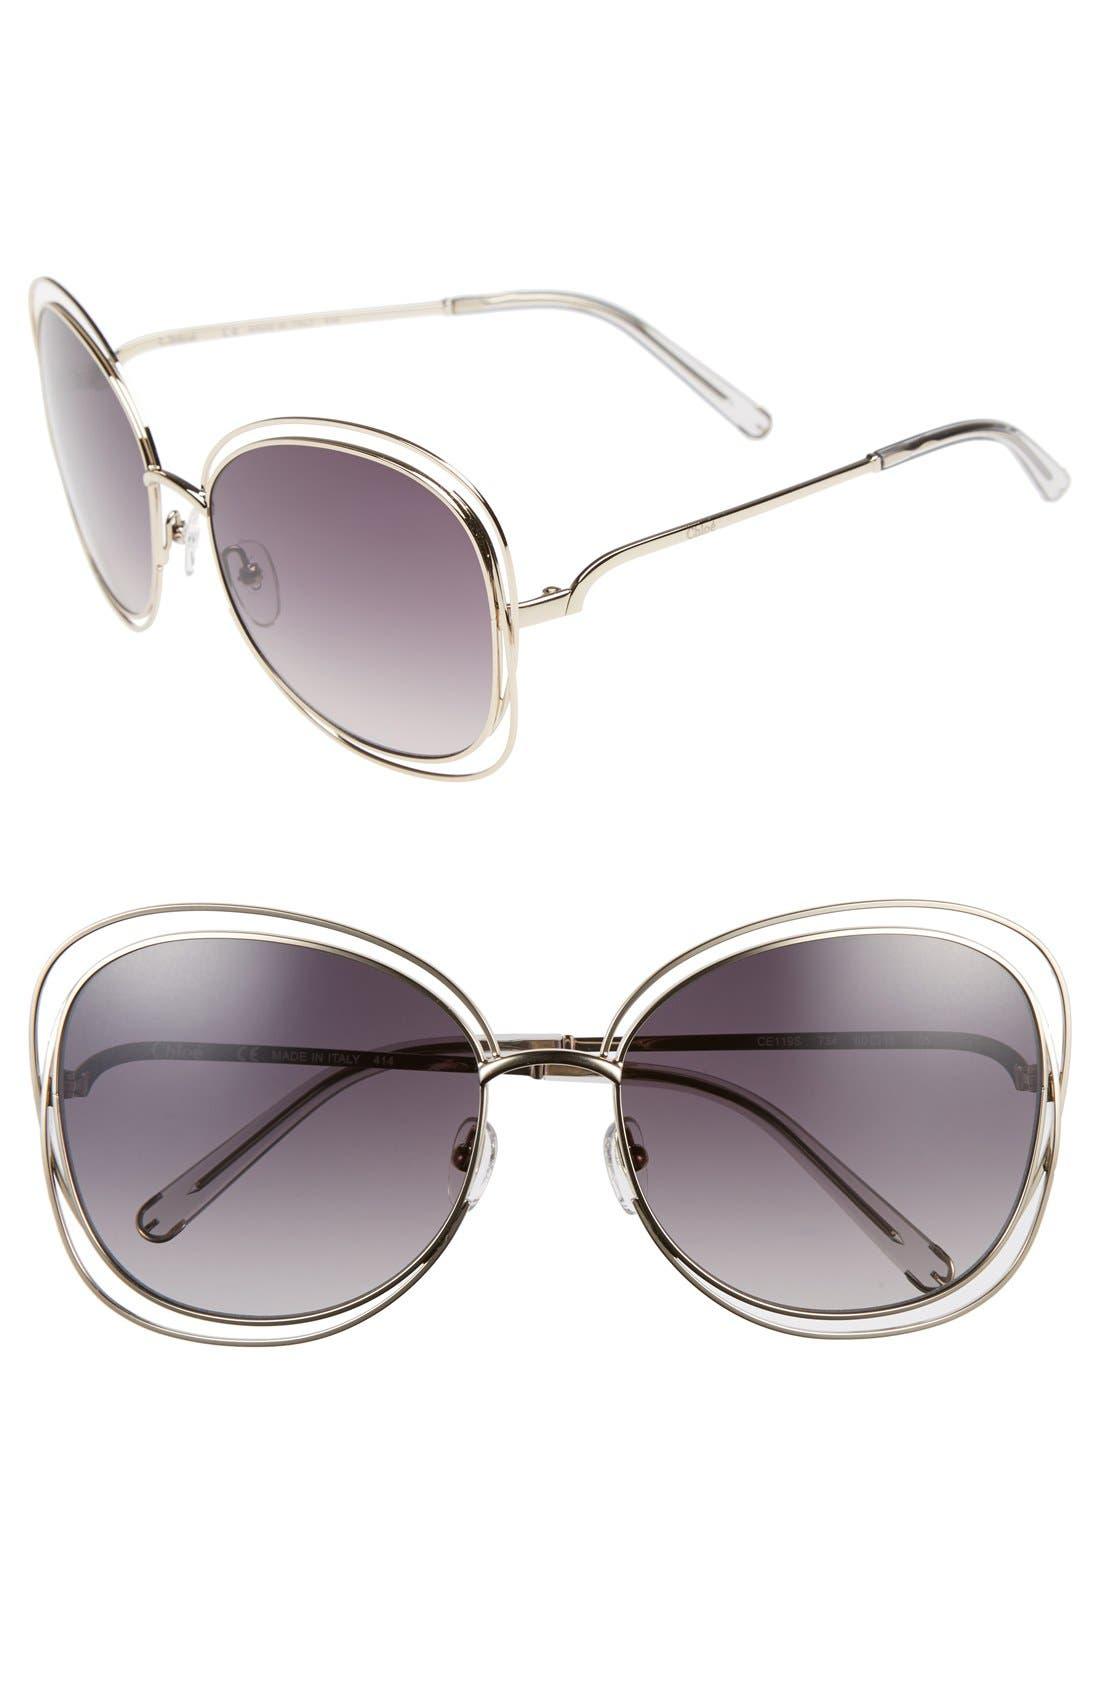 Carlina 60mm Gradient Les Sunglasses,                             Main thumbnail 1, color,                             GOLD/ LIGHT GREY